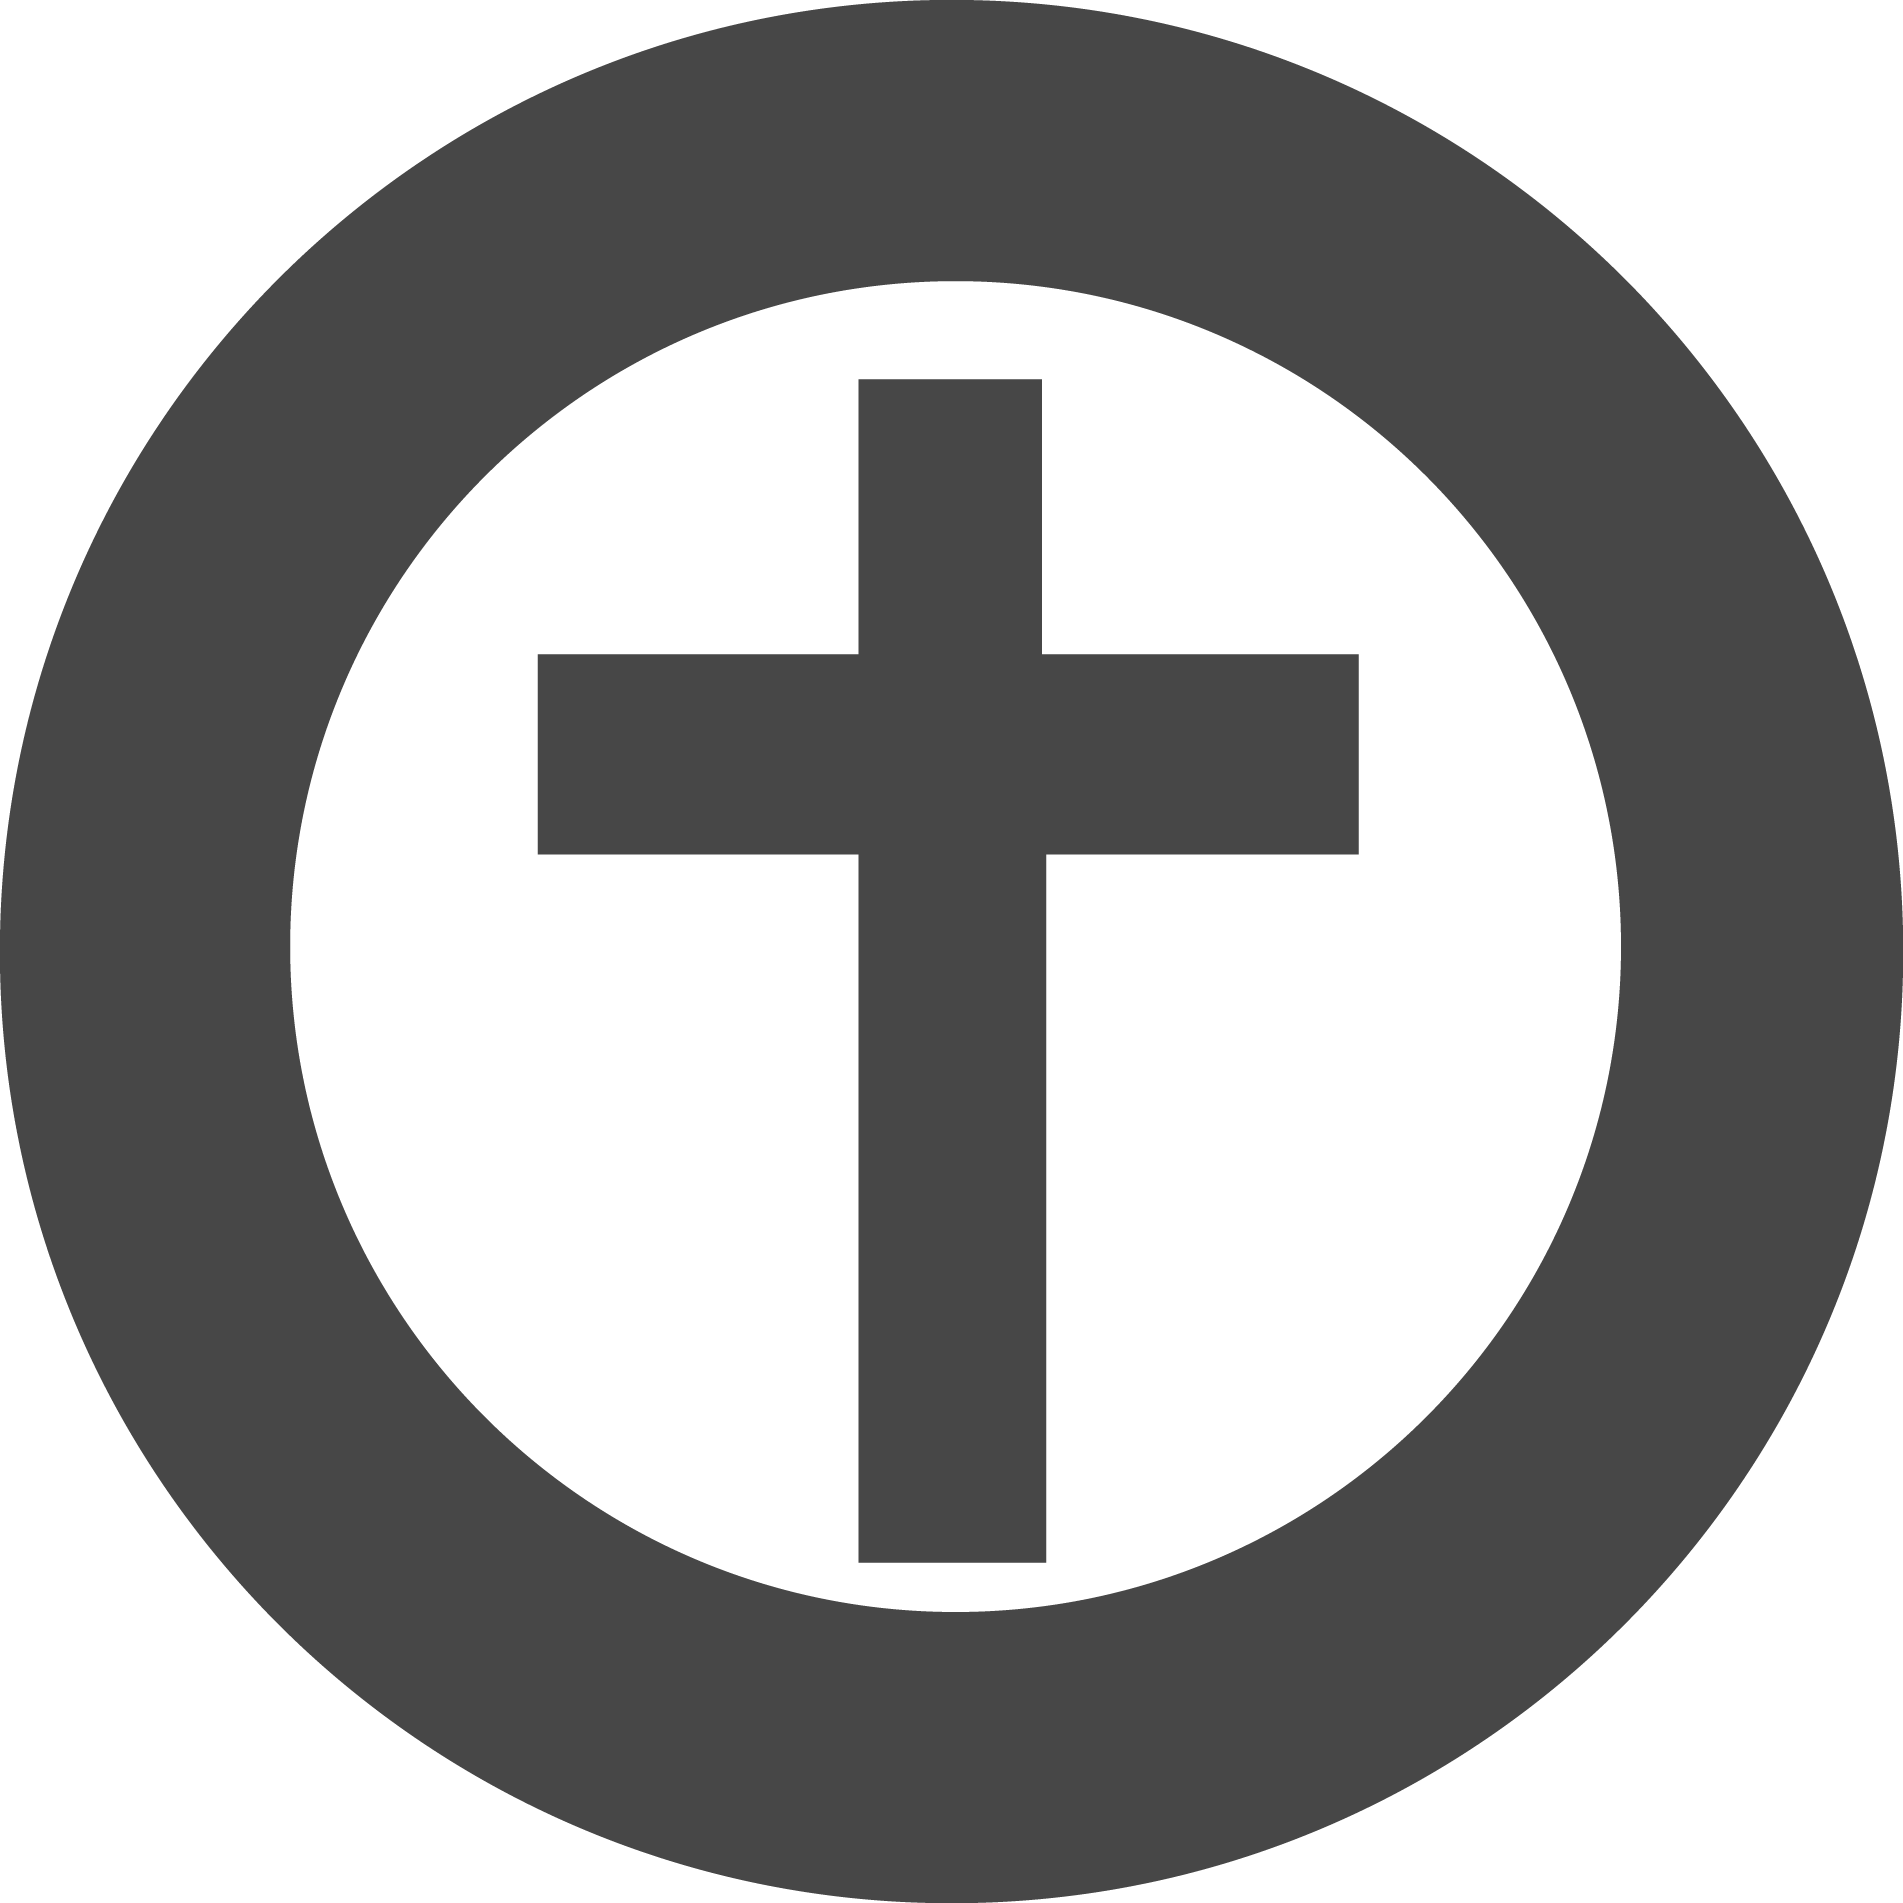 FoundationFocus_logos_gray_cross.png